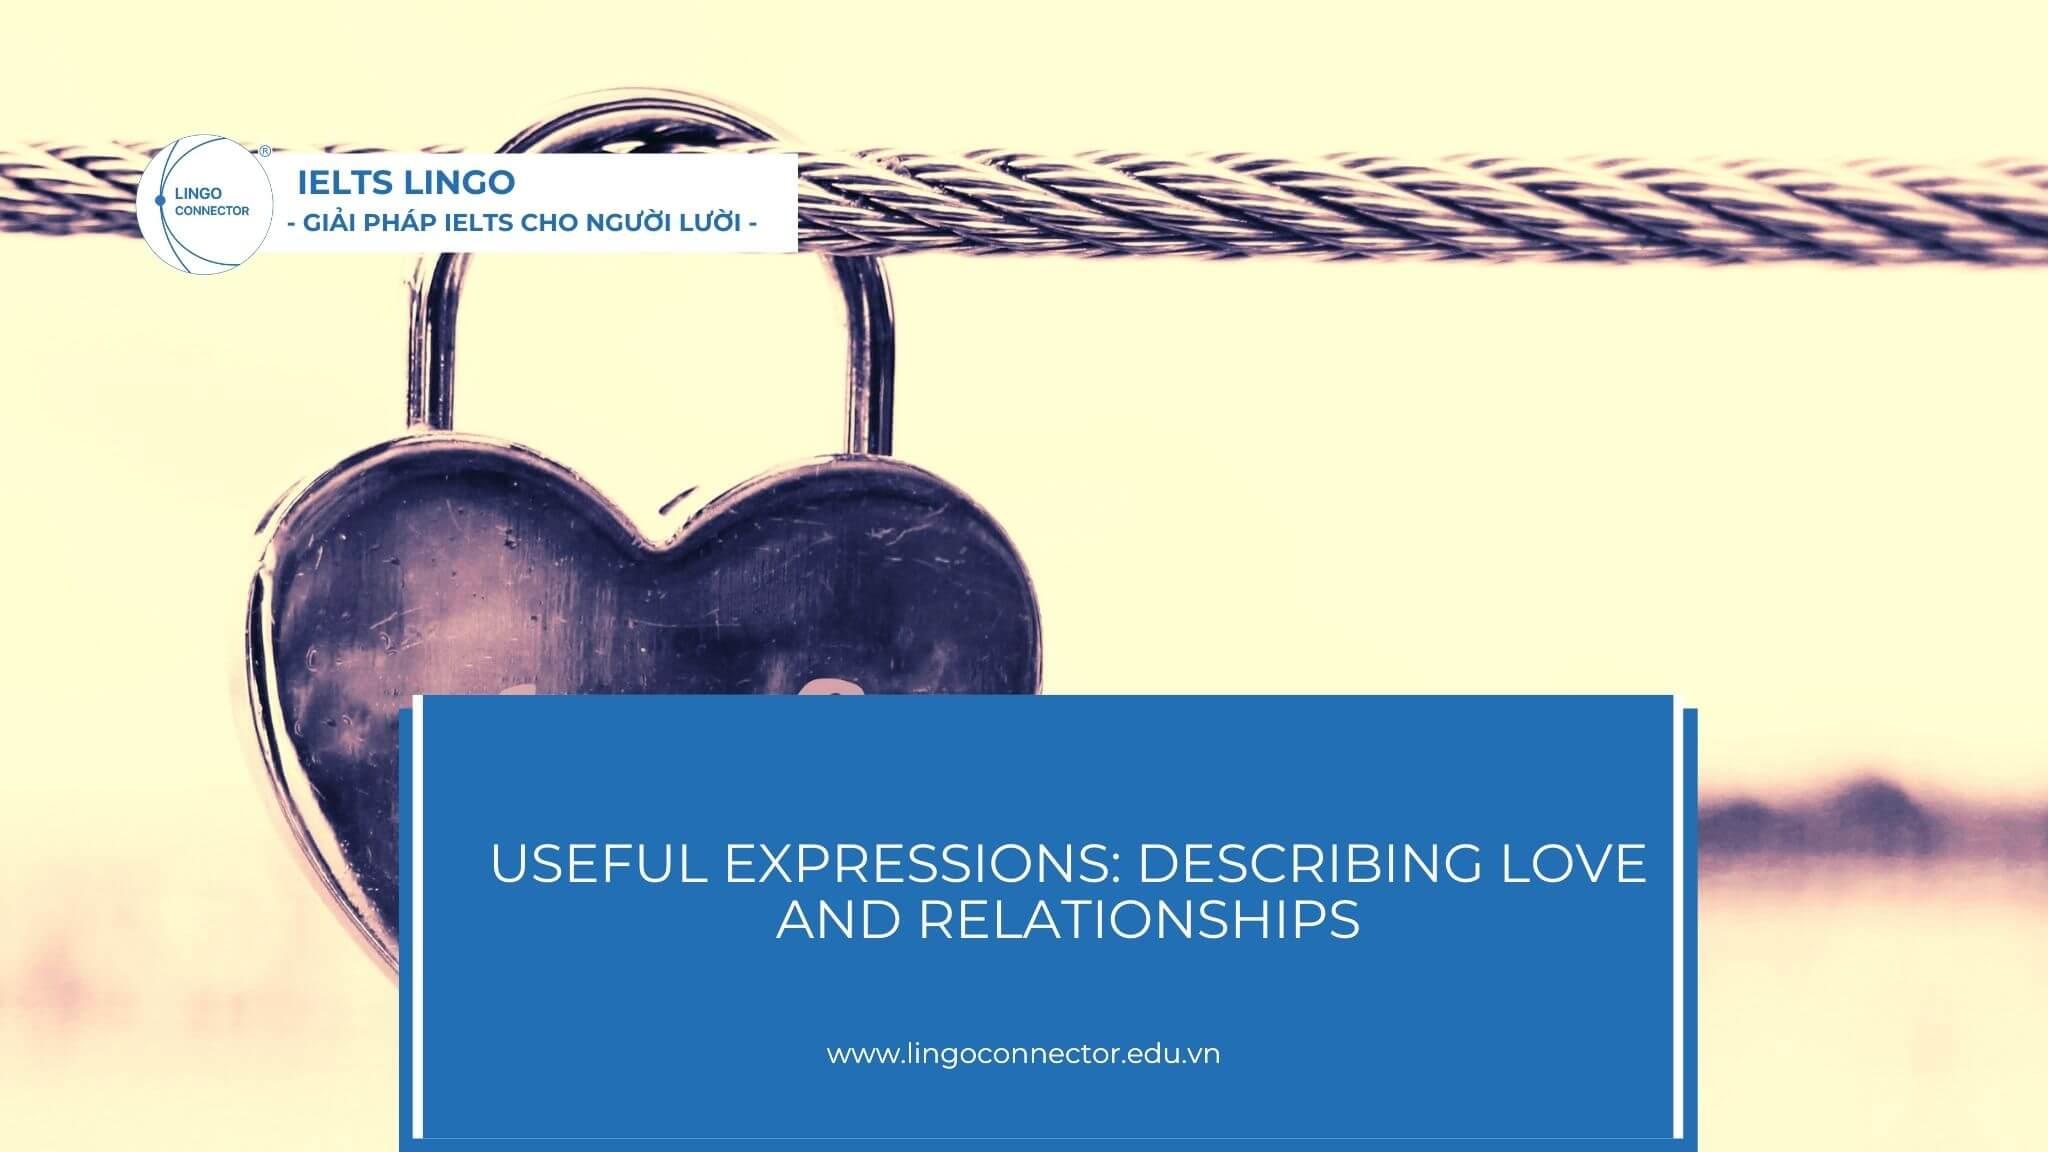 describing-love-and-relationships